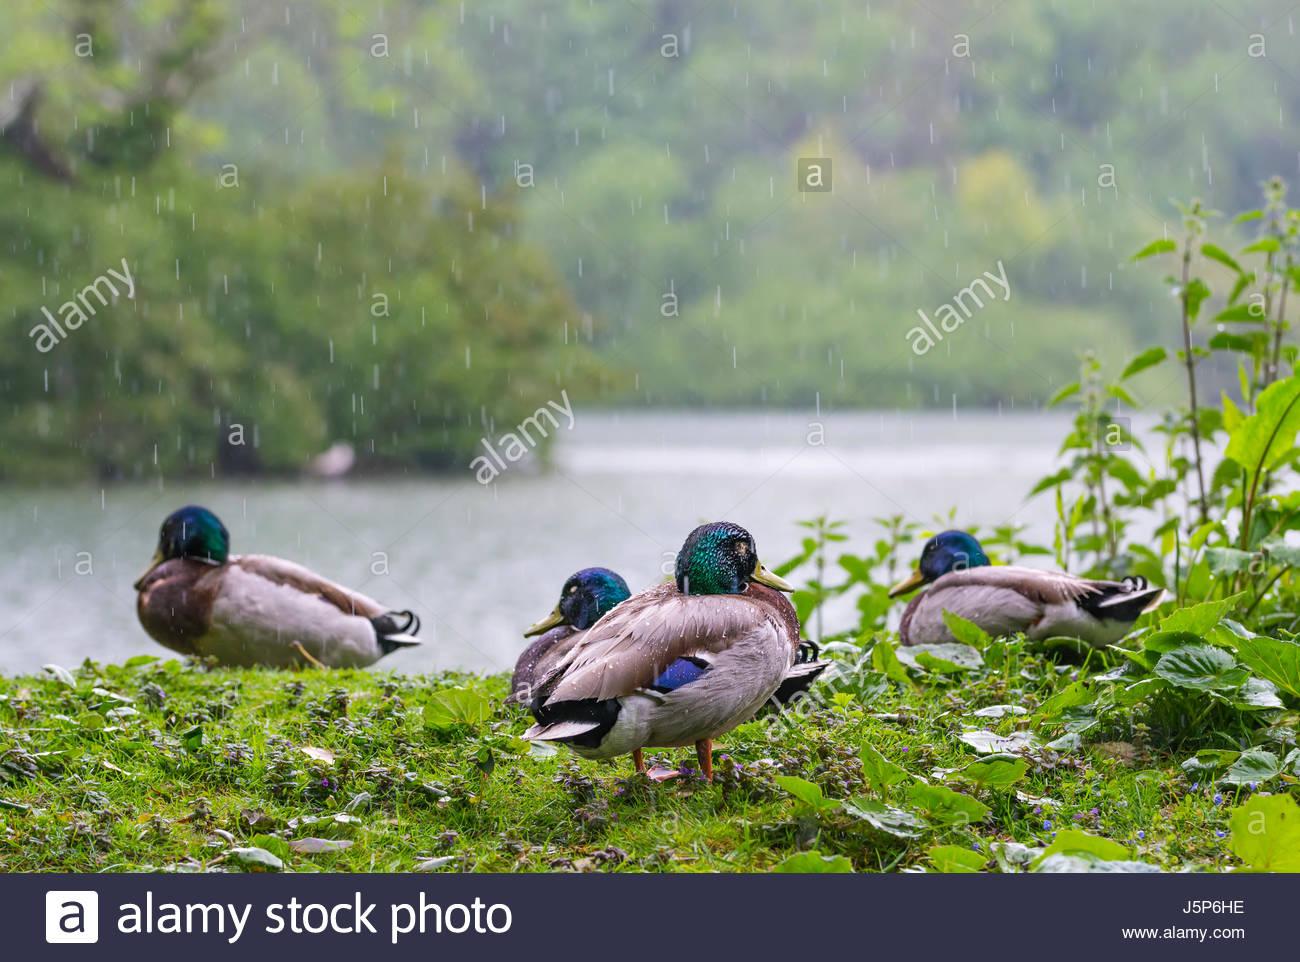 mallard-ducks-sitting-on-a-grass-bank-by